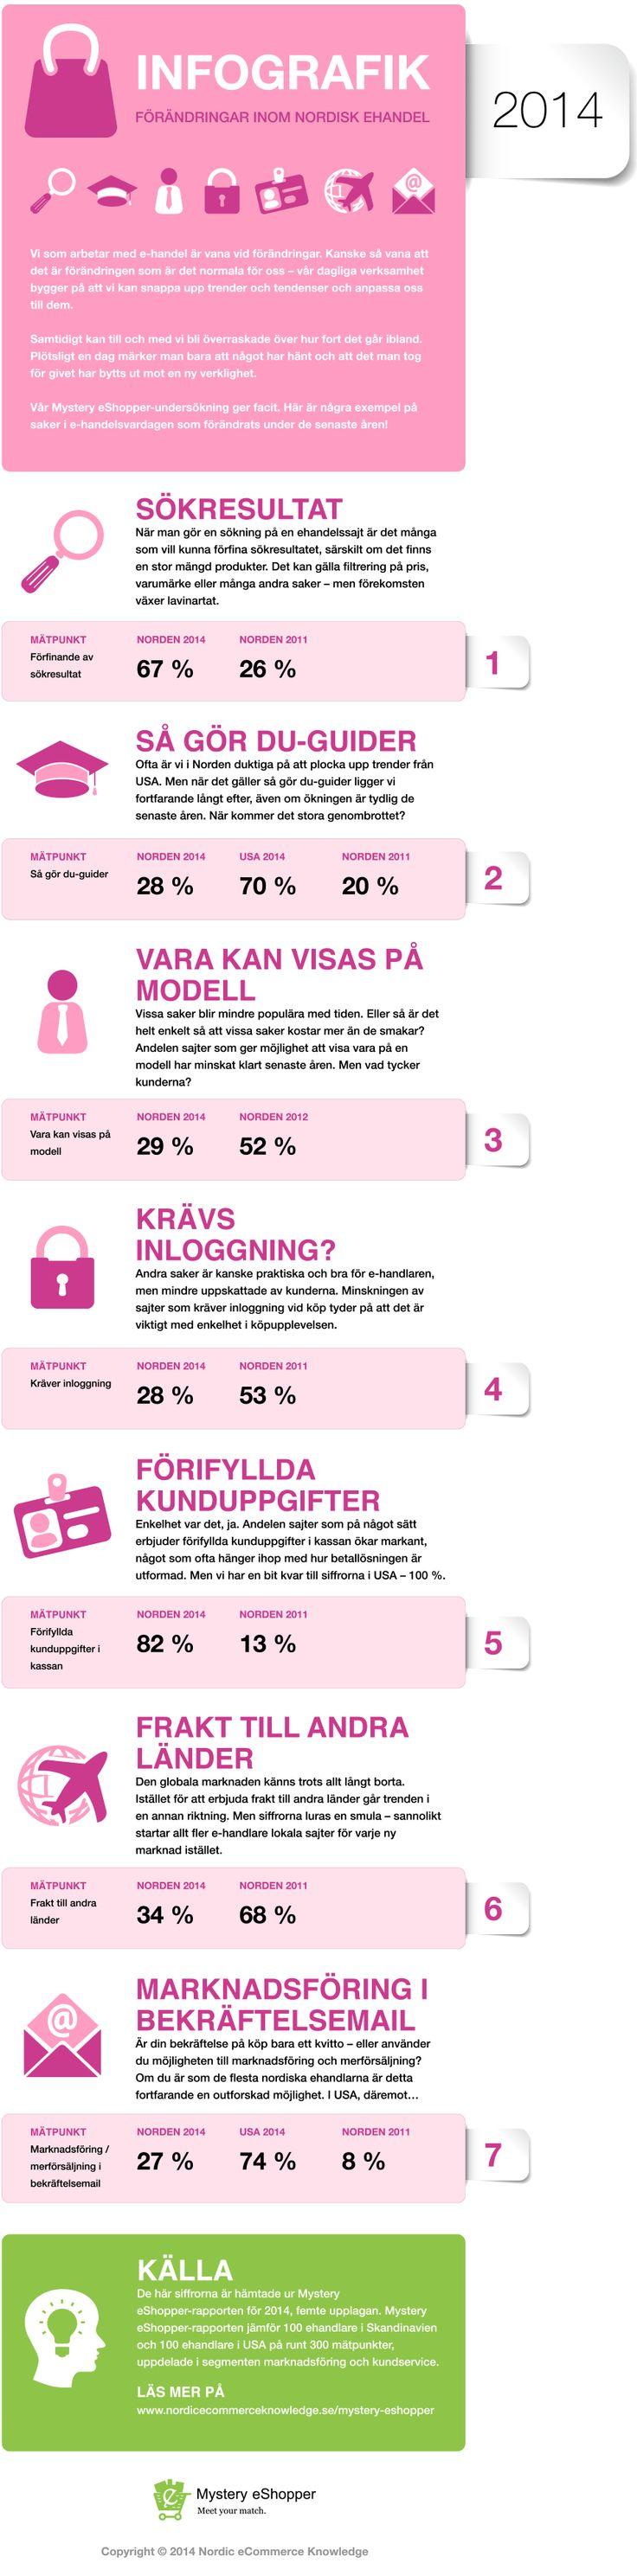 INFOGRAFIK – förändringar inom nordisk ehandel : Nordic eCommerce Knowledge. #ehandel